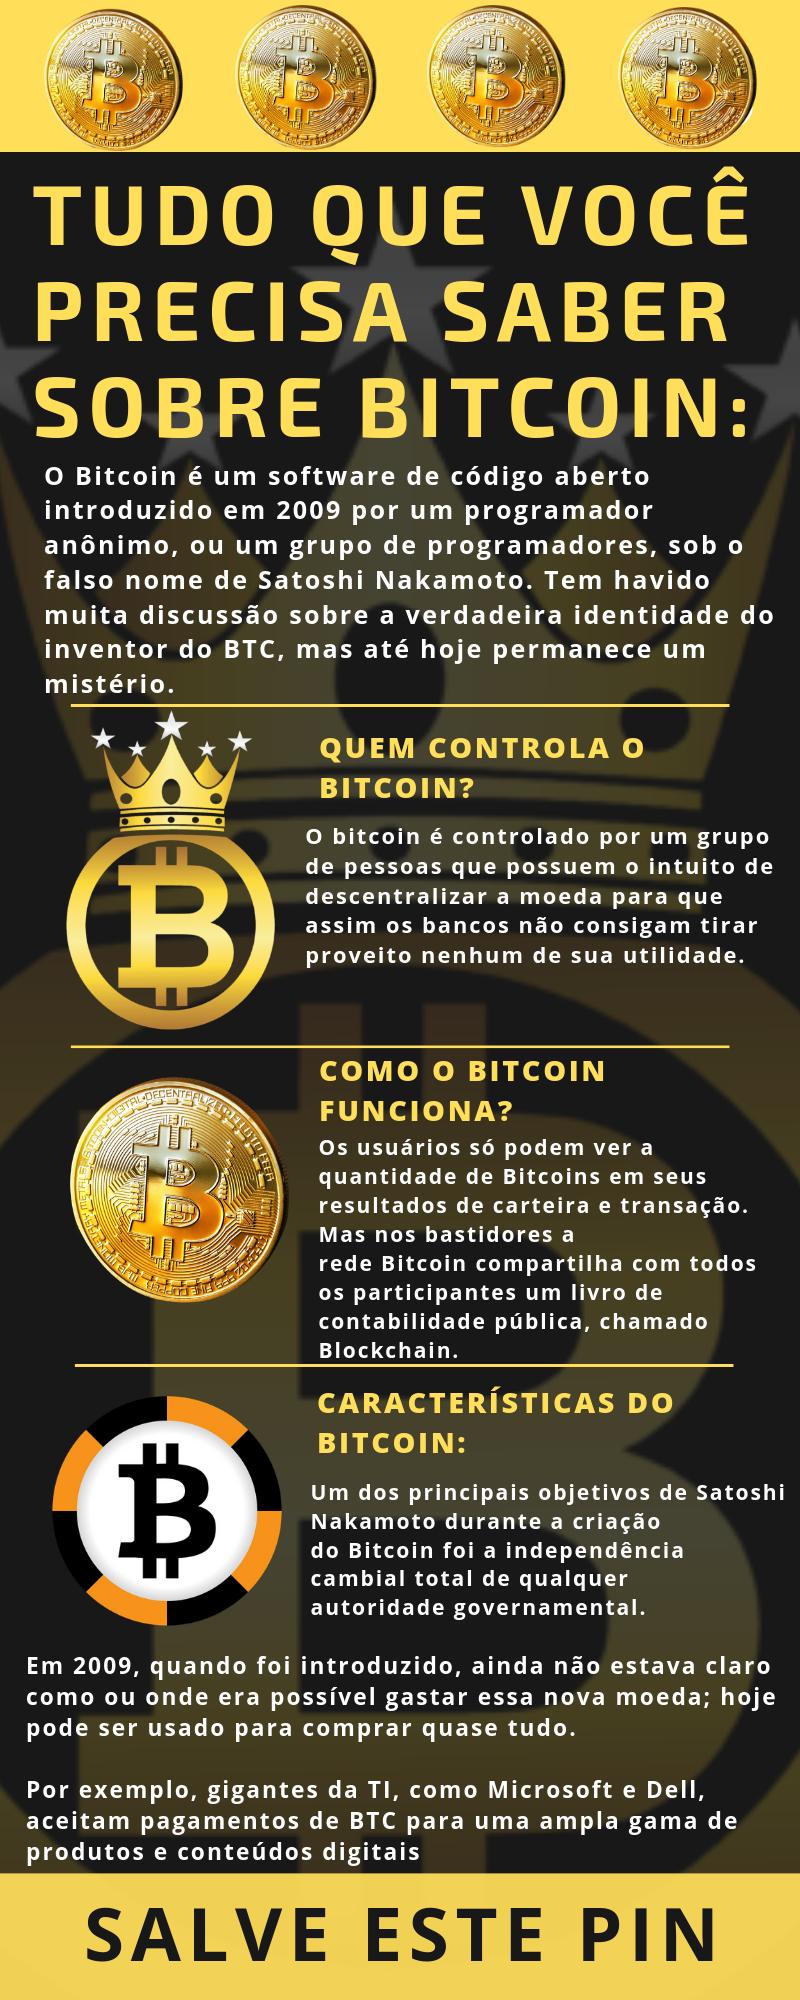 Cumpara sau vinde bitcoin online · Bani pe net si cum sa